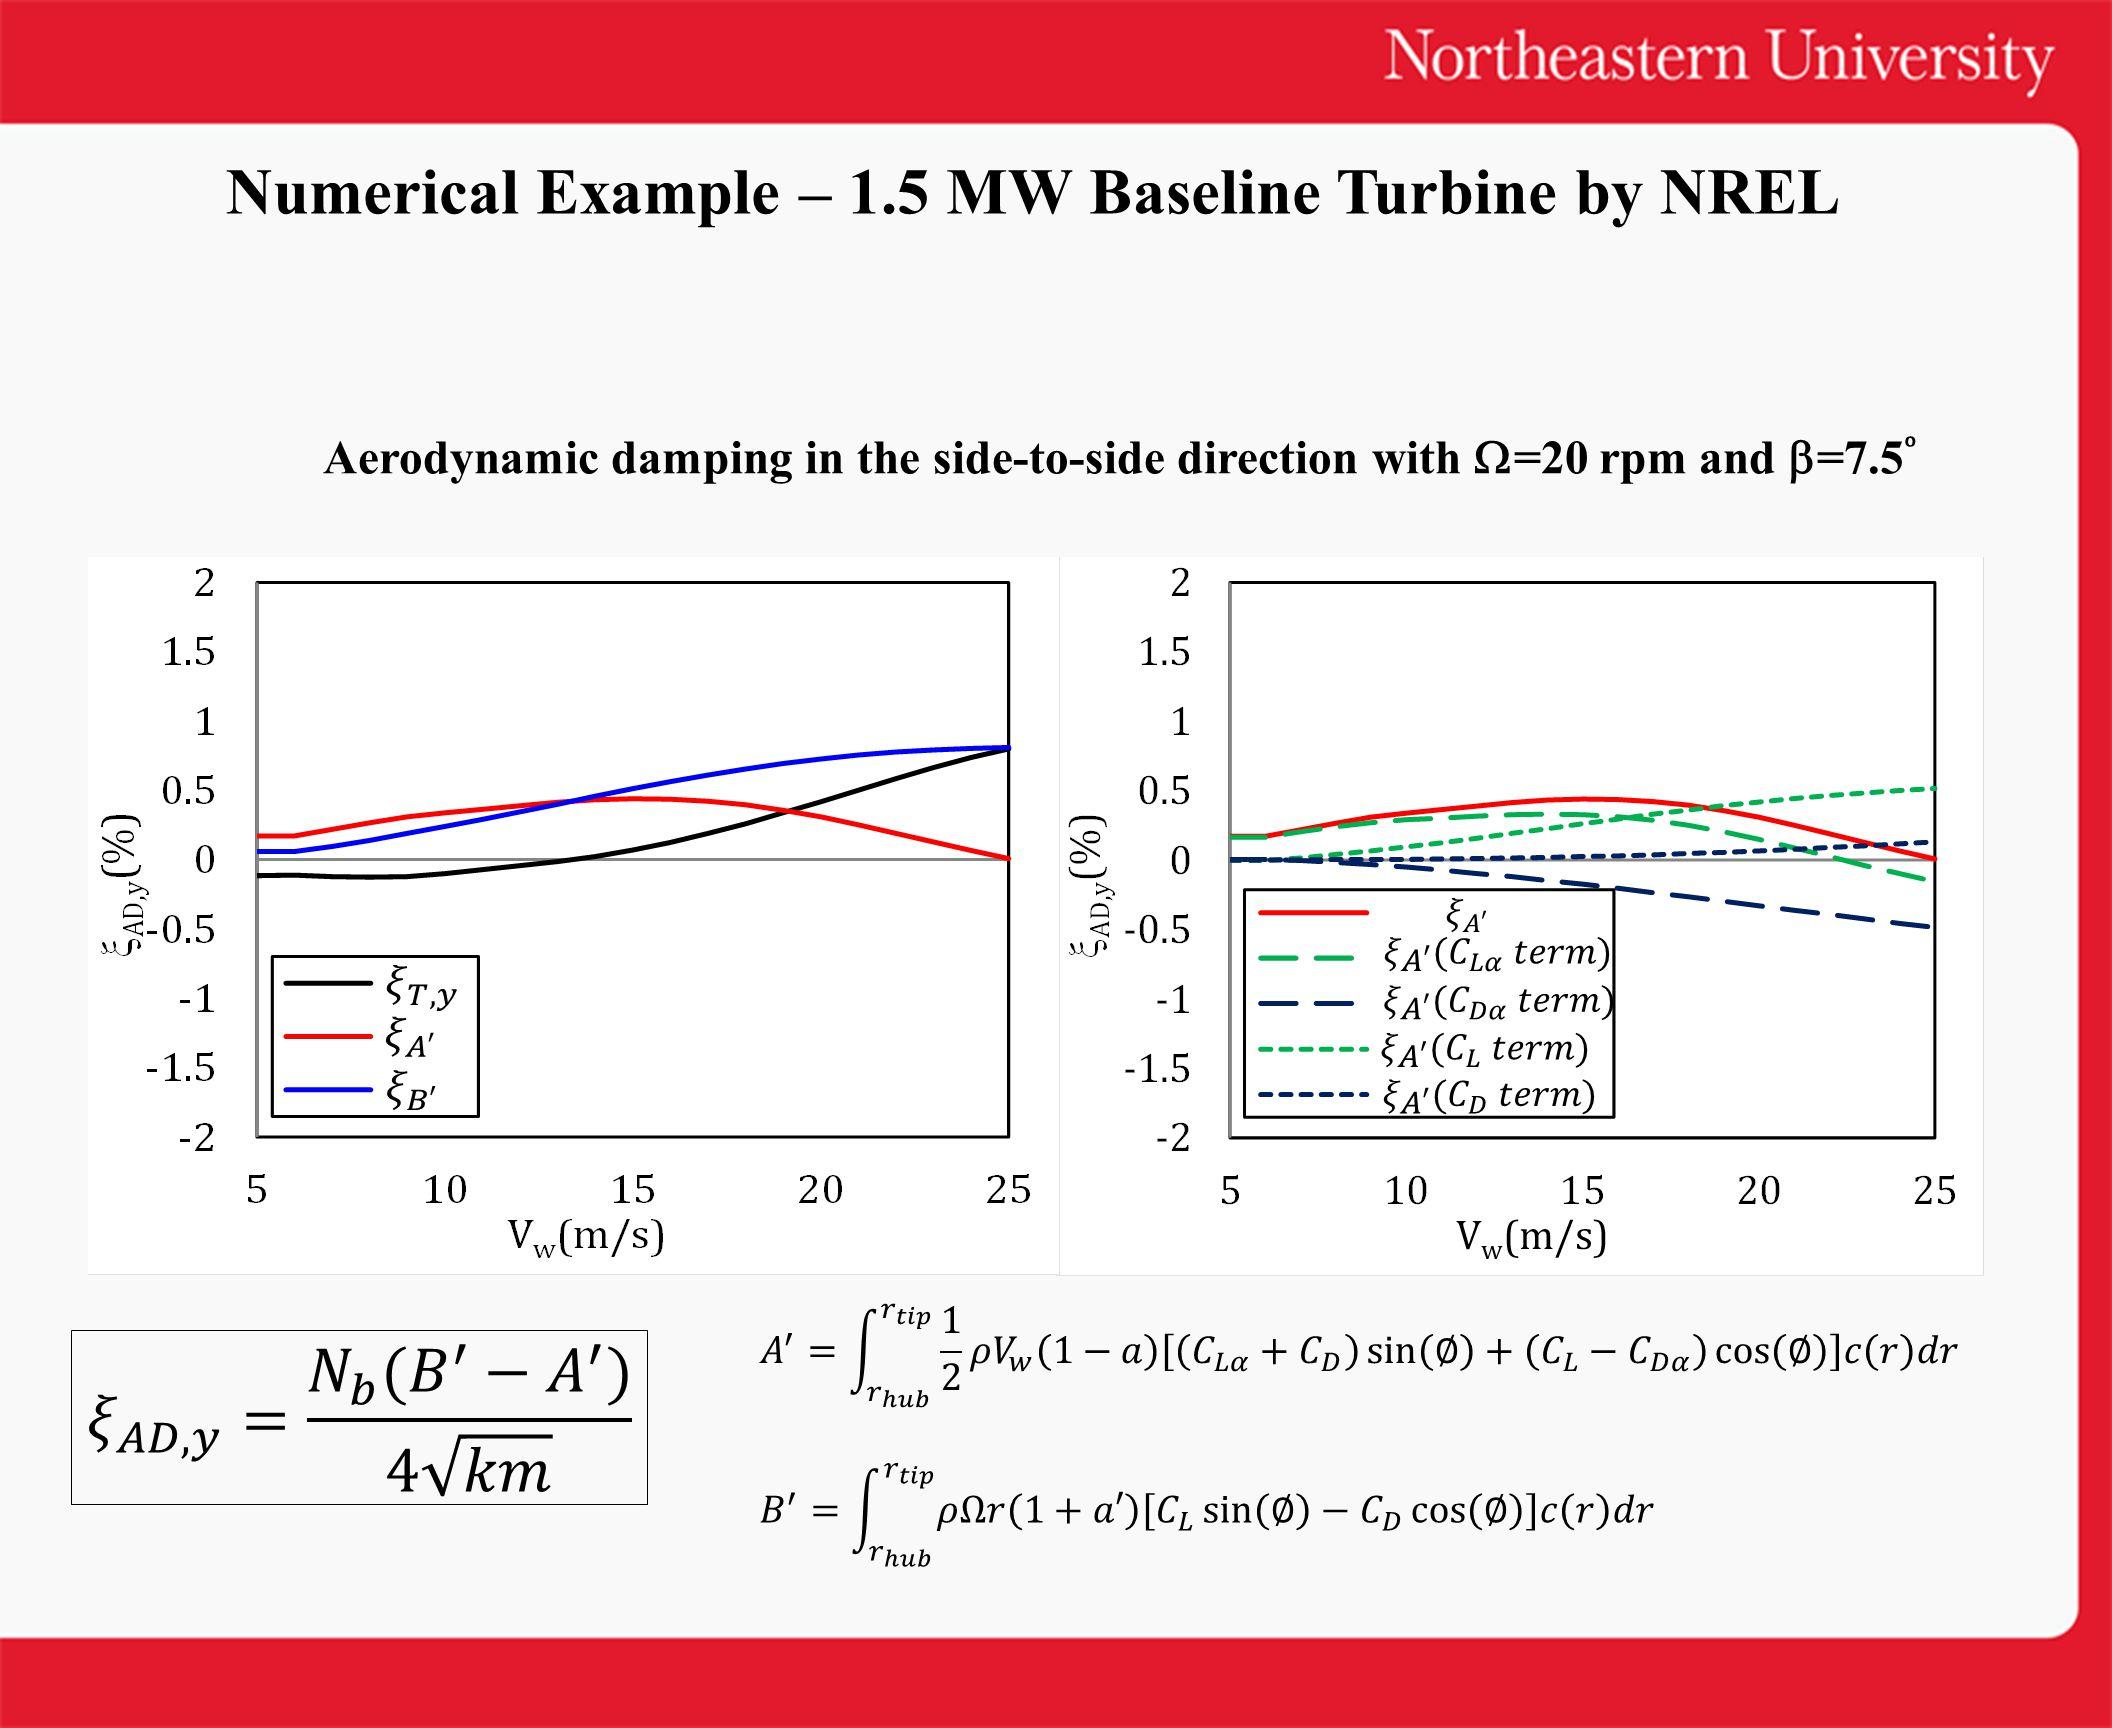 Numerical Example – 1.5 MW Baseline Turbine by NREL